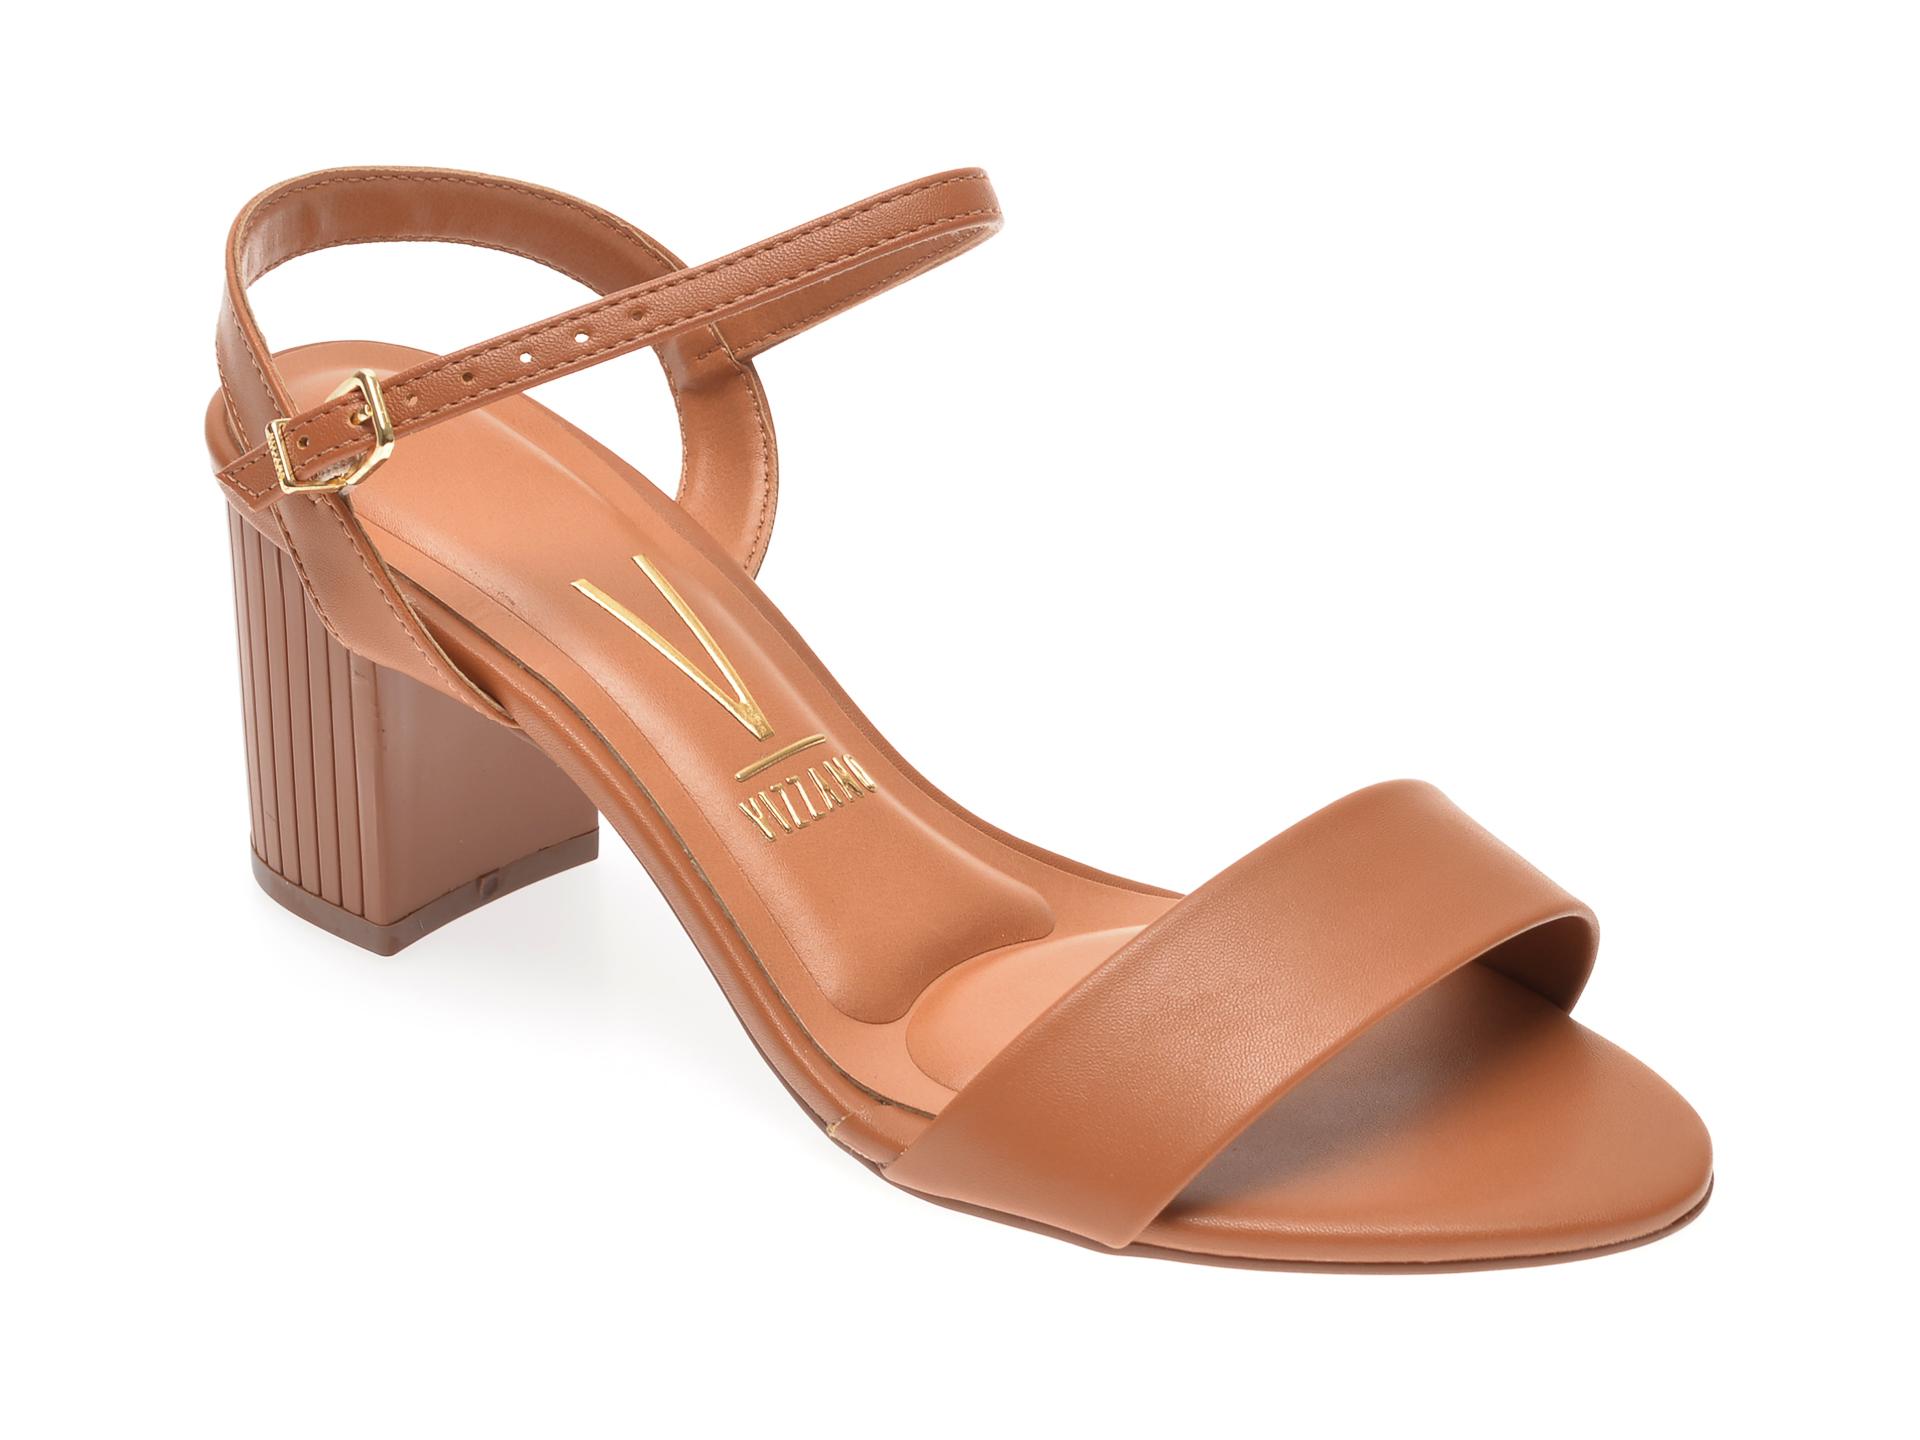 Sandale VIZZANO maro, 6375304, din piele ecologica